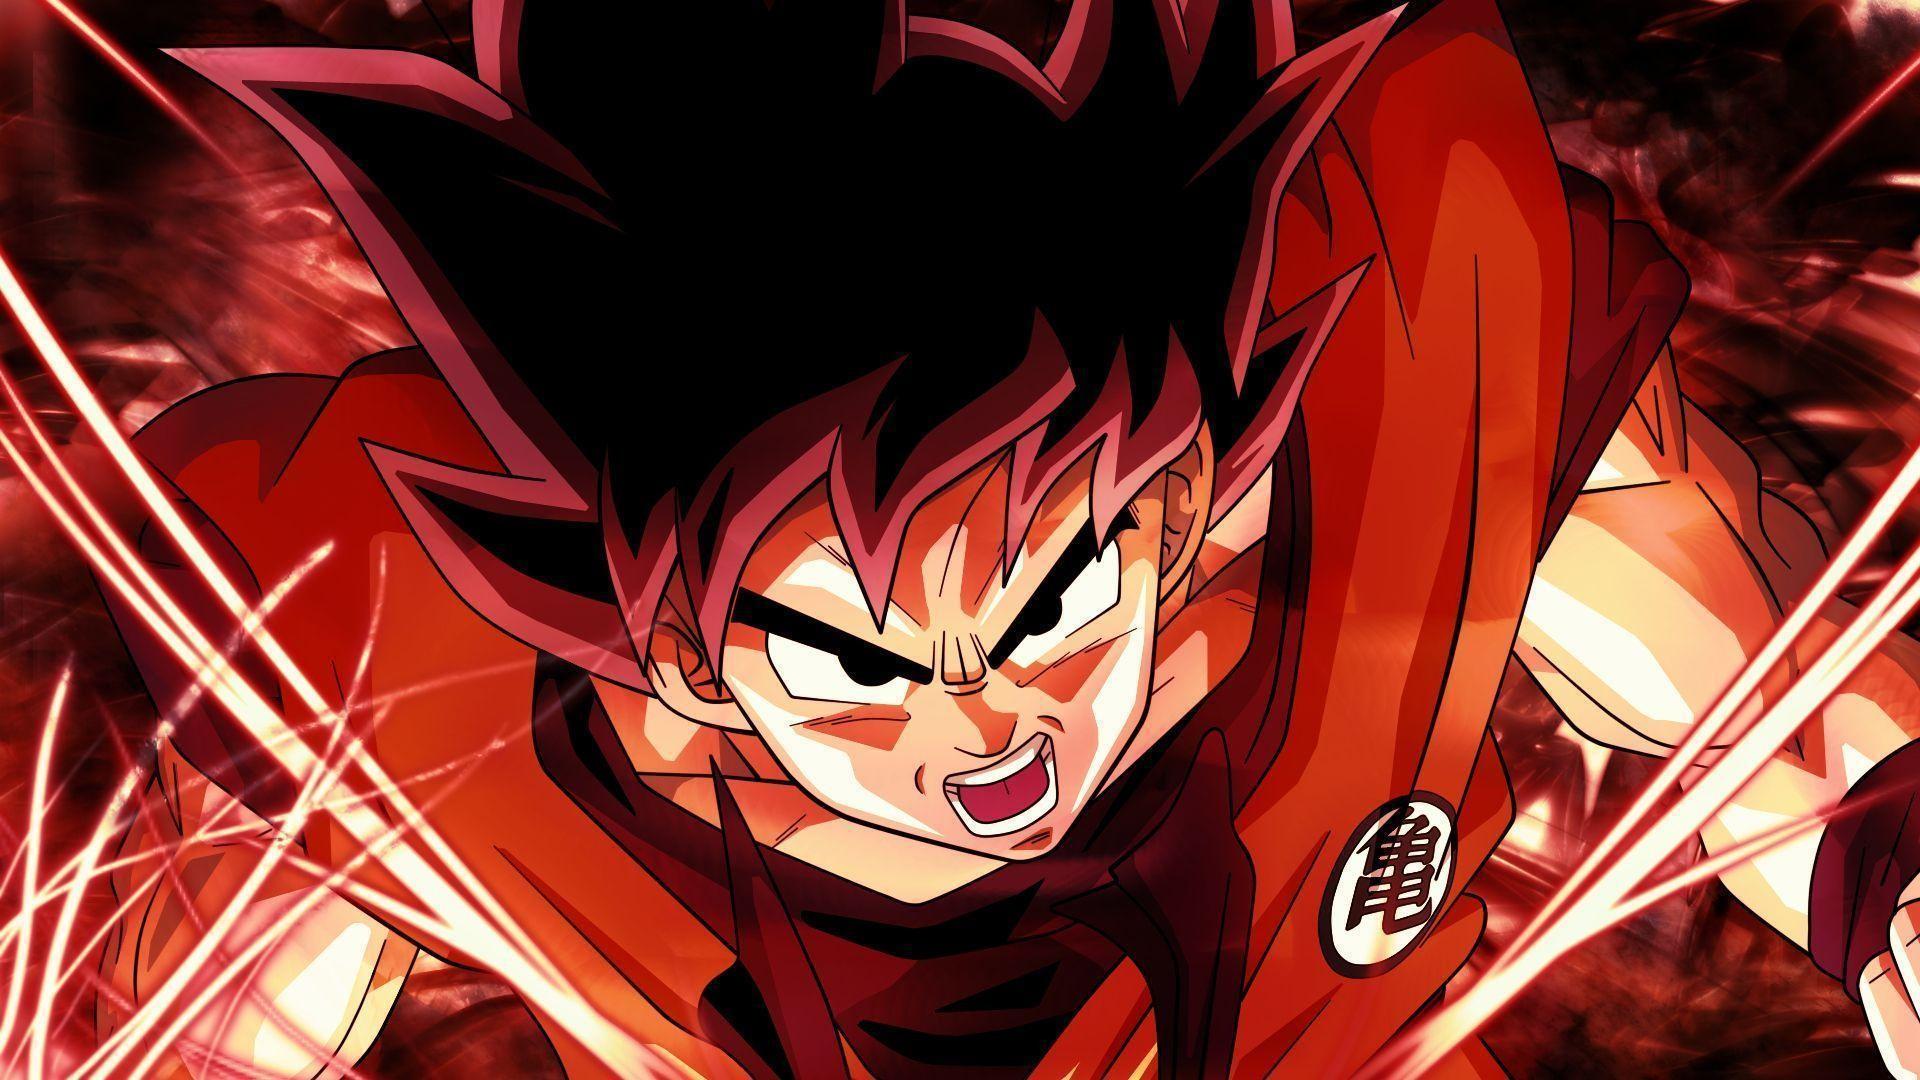 Super Saiyan 4 Goku and Vegeta Wallpapers (60+ images)